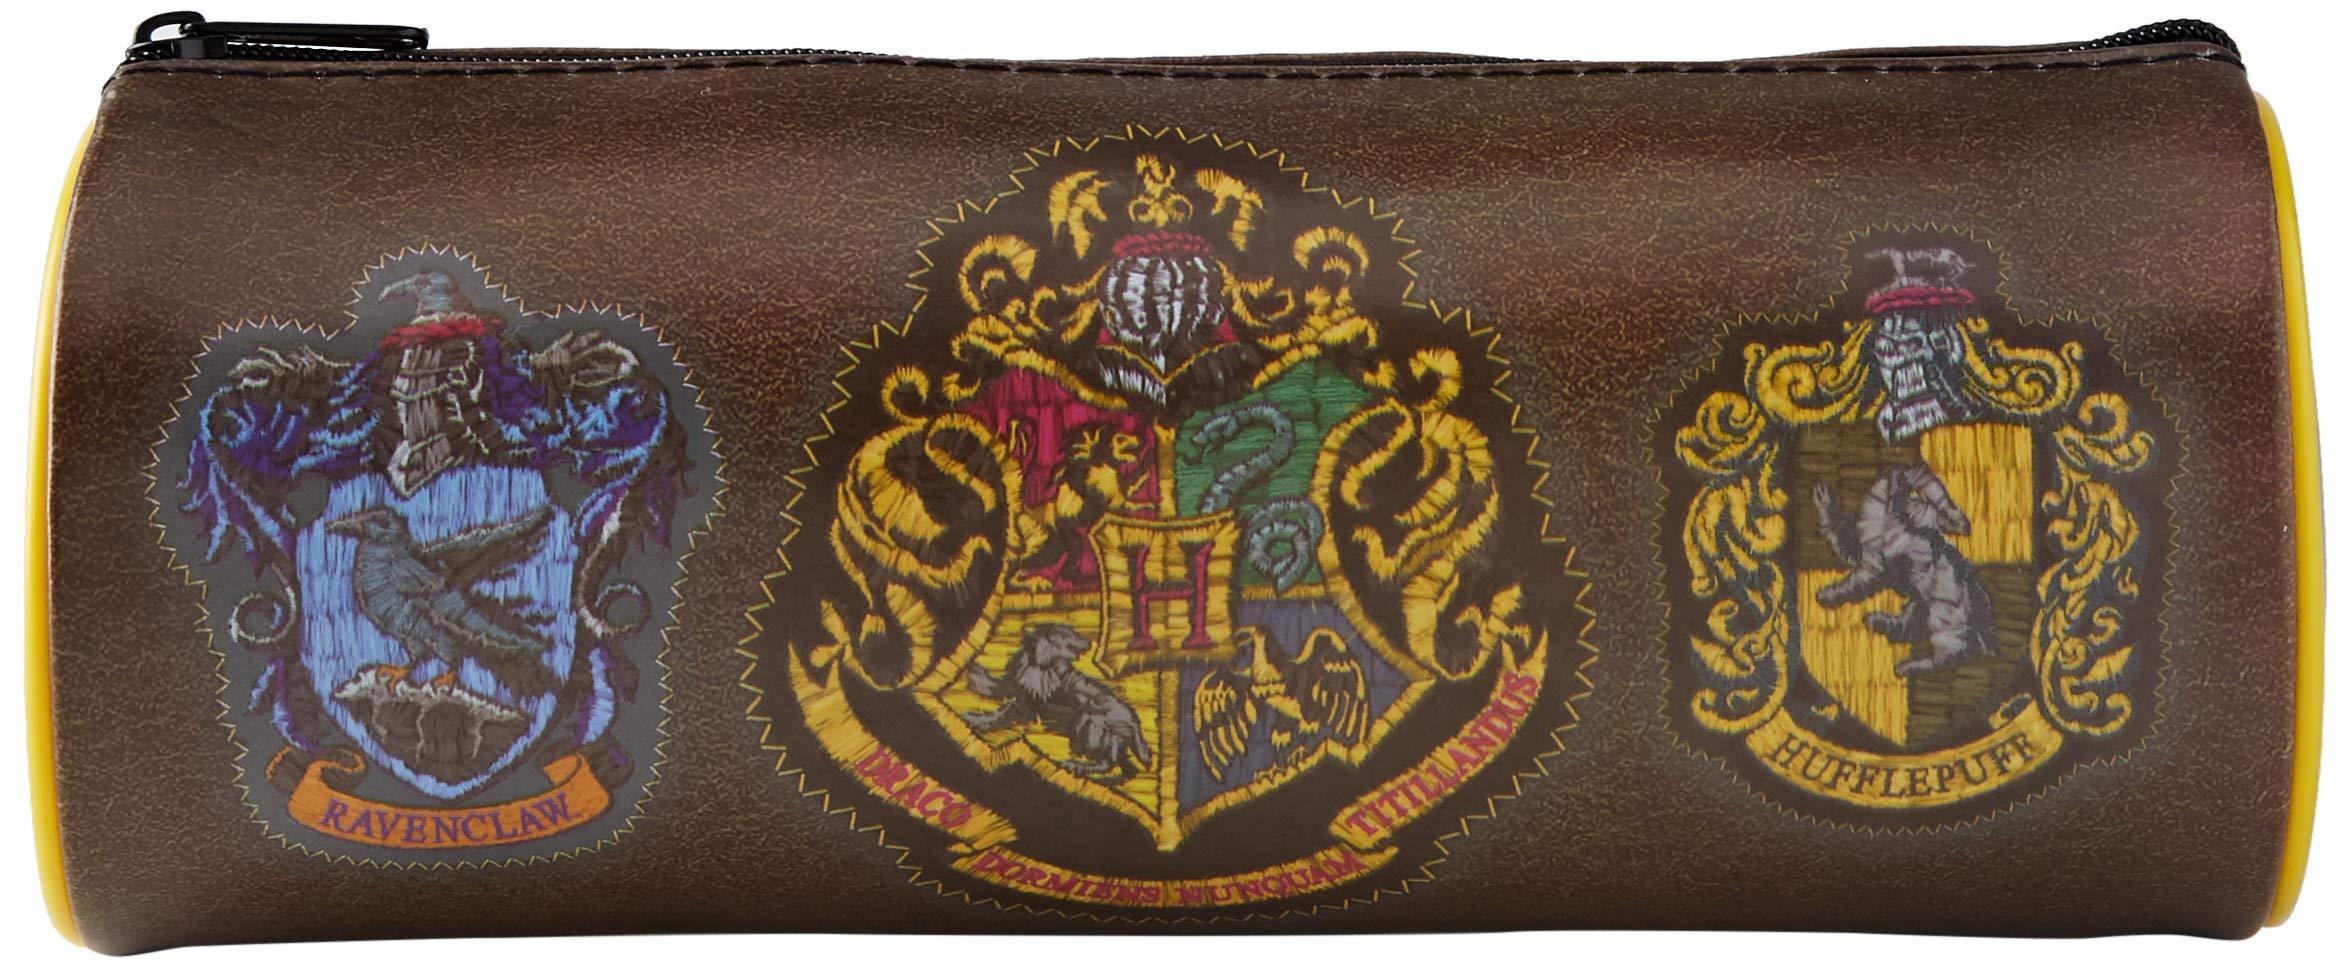 "Pyramid International Harry Potter""Crests"" Pencil Case"